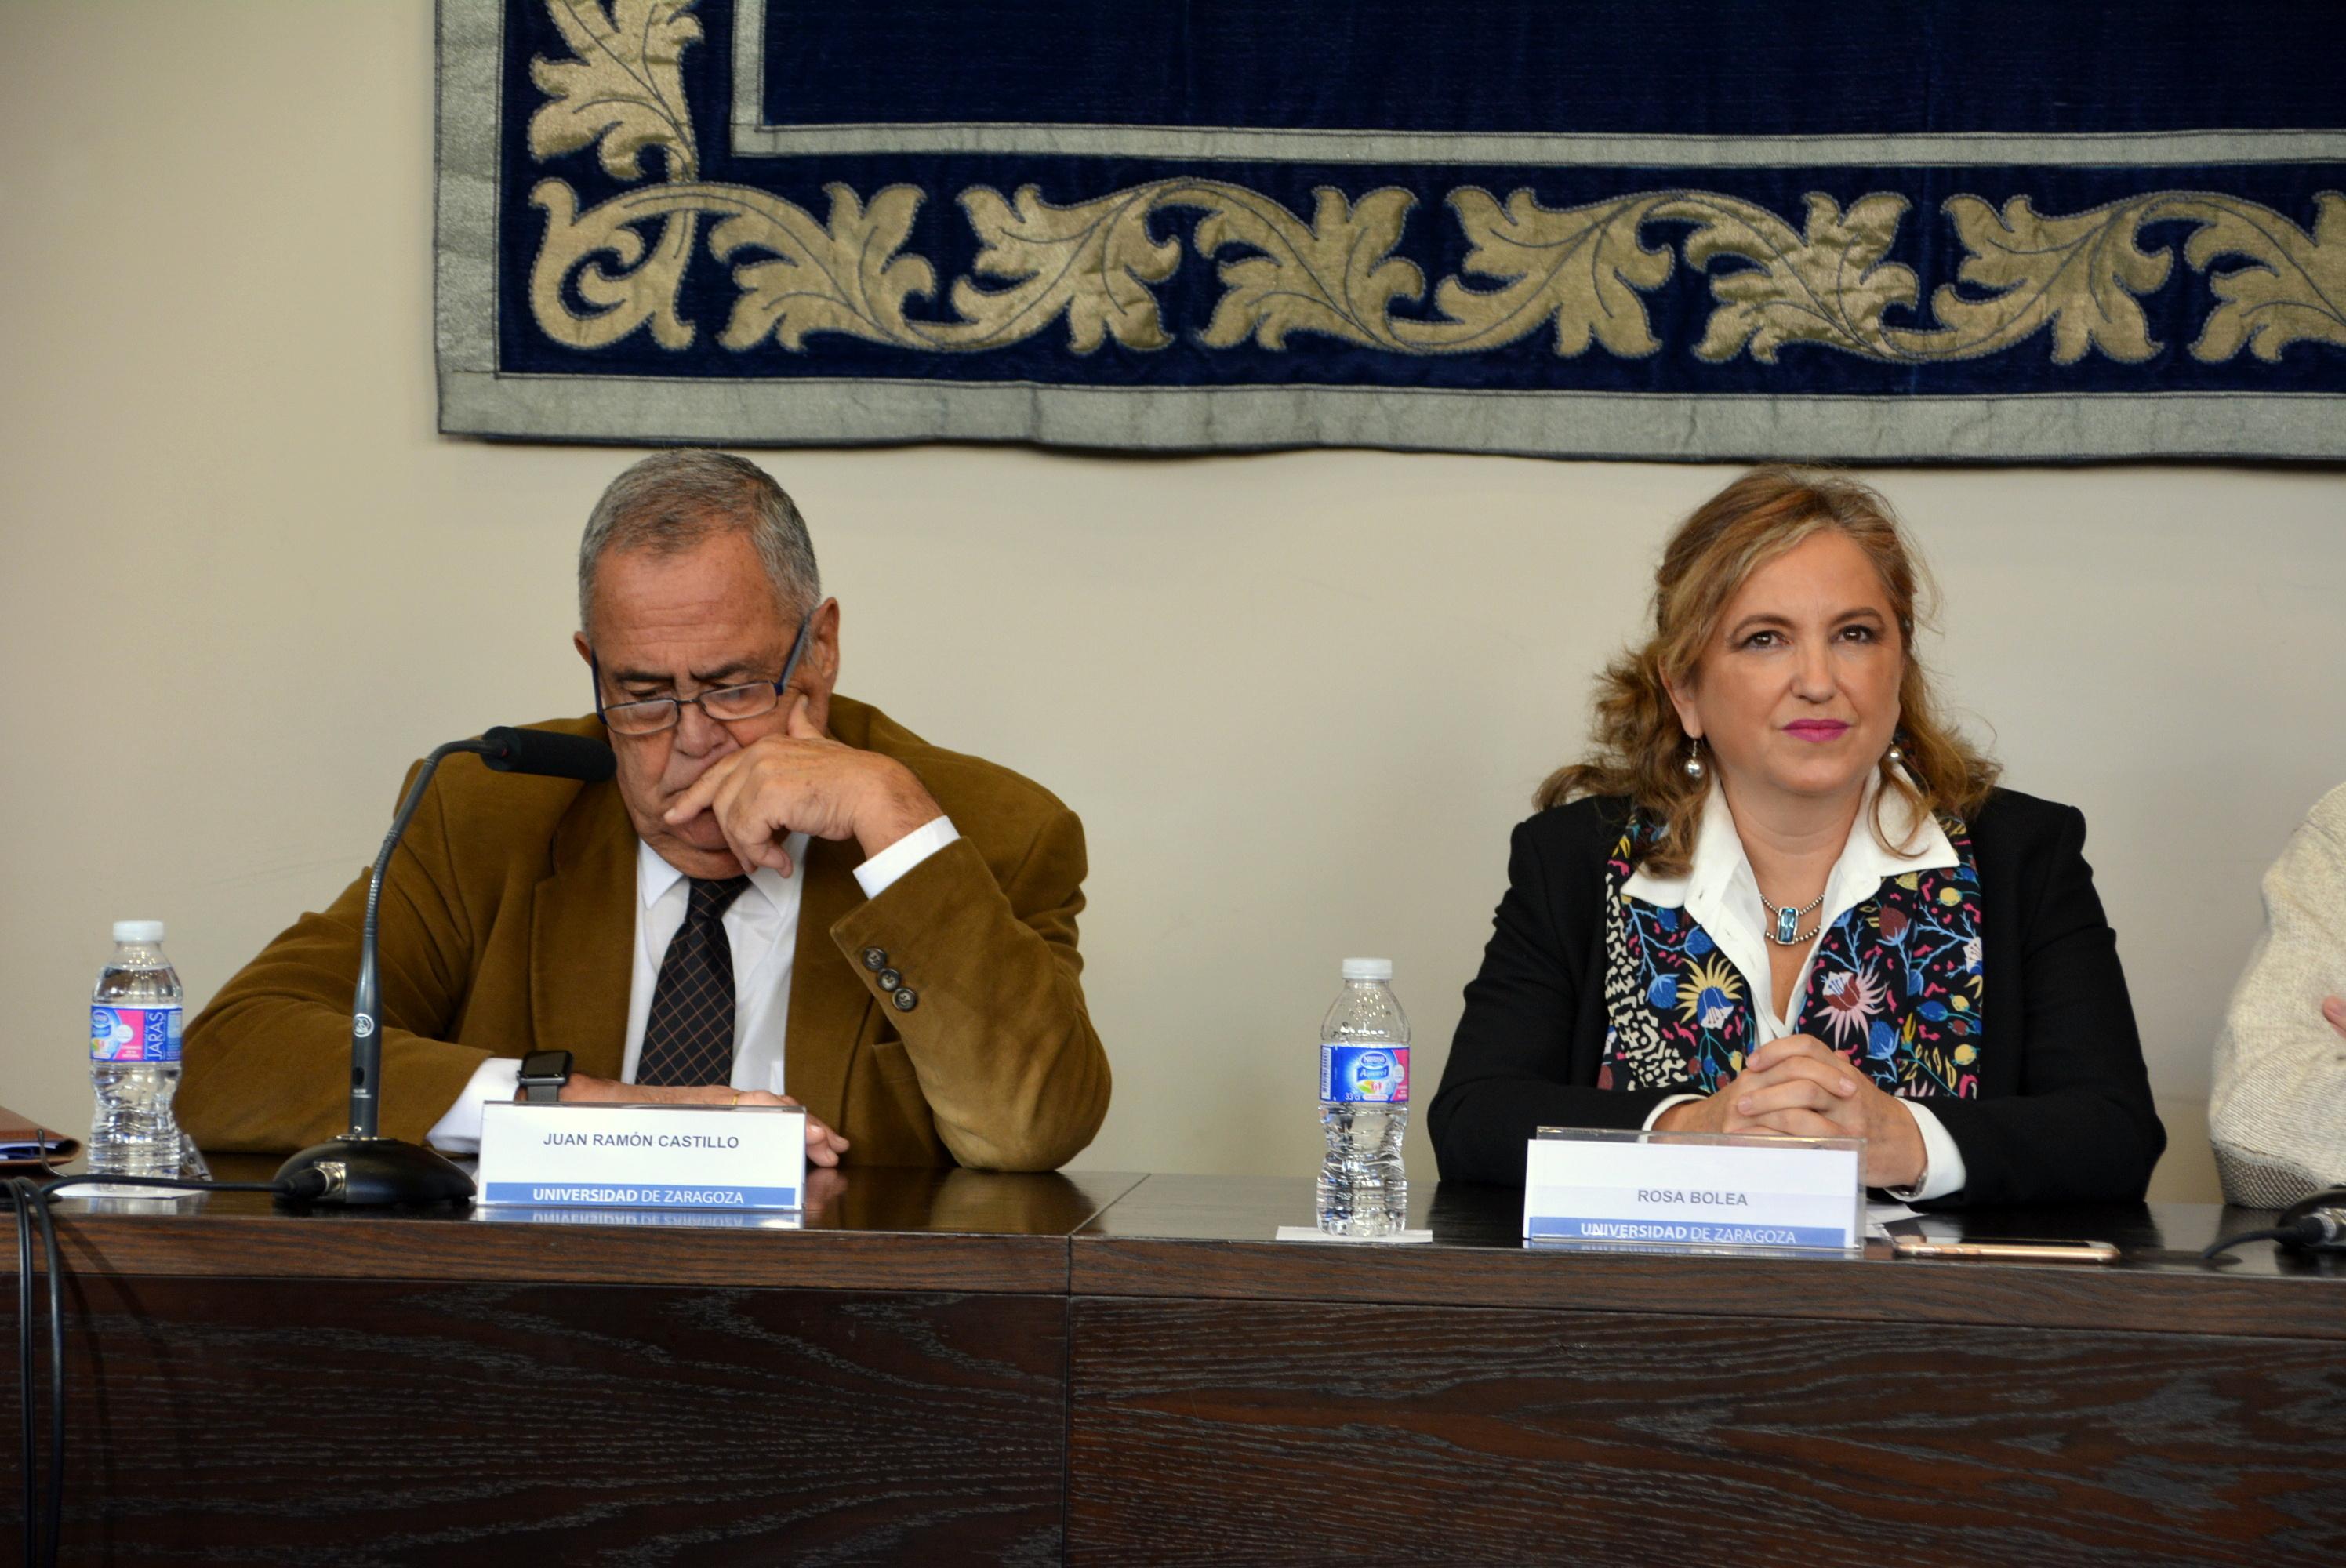 Conférence de presse au Paraninfo de l'Université de Saragosse.